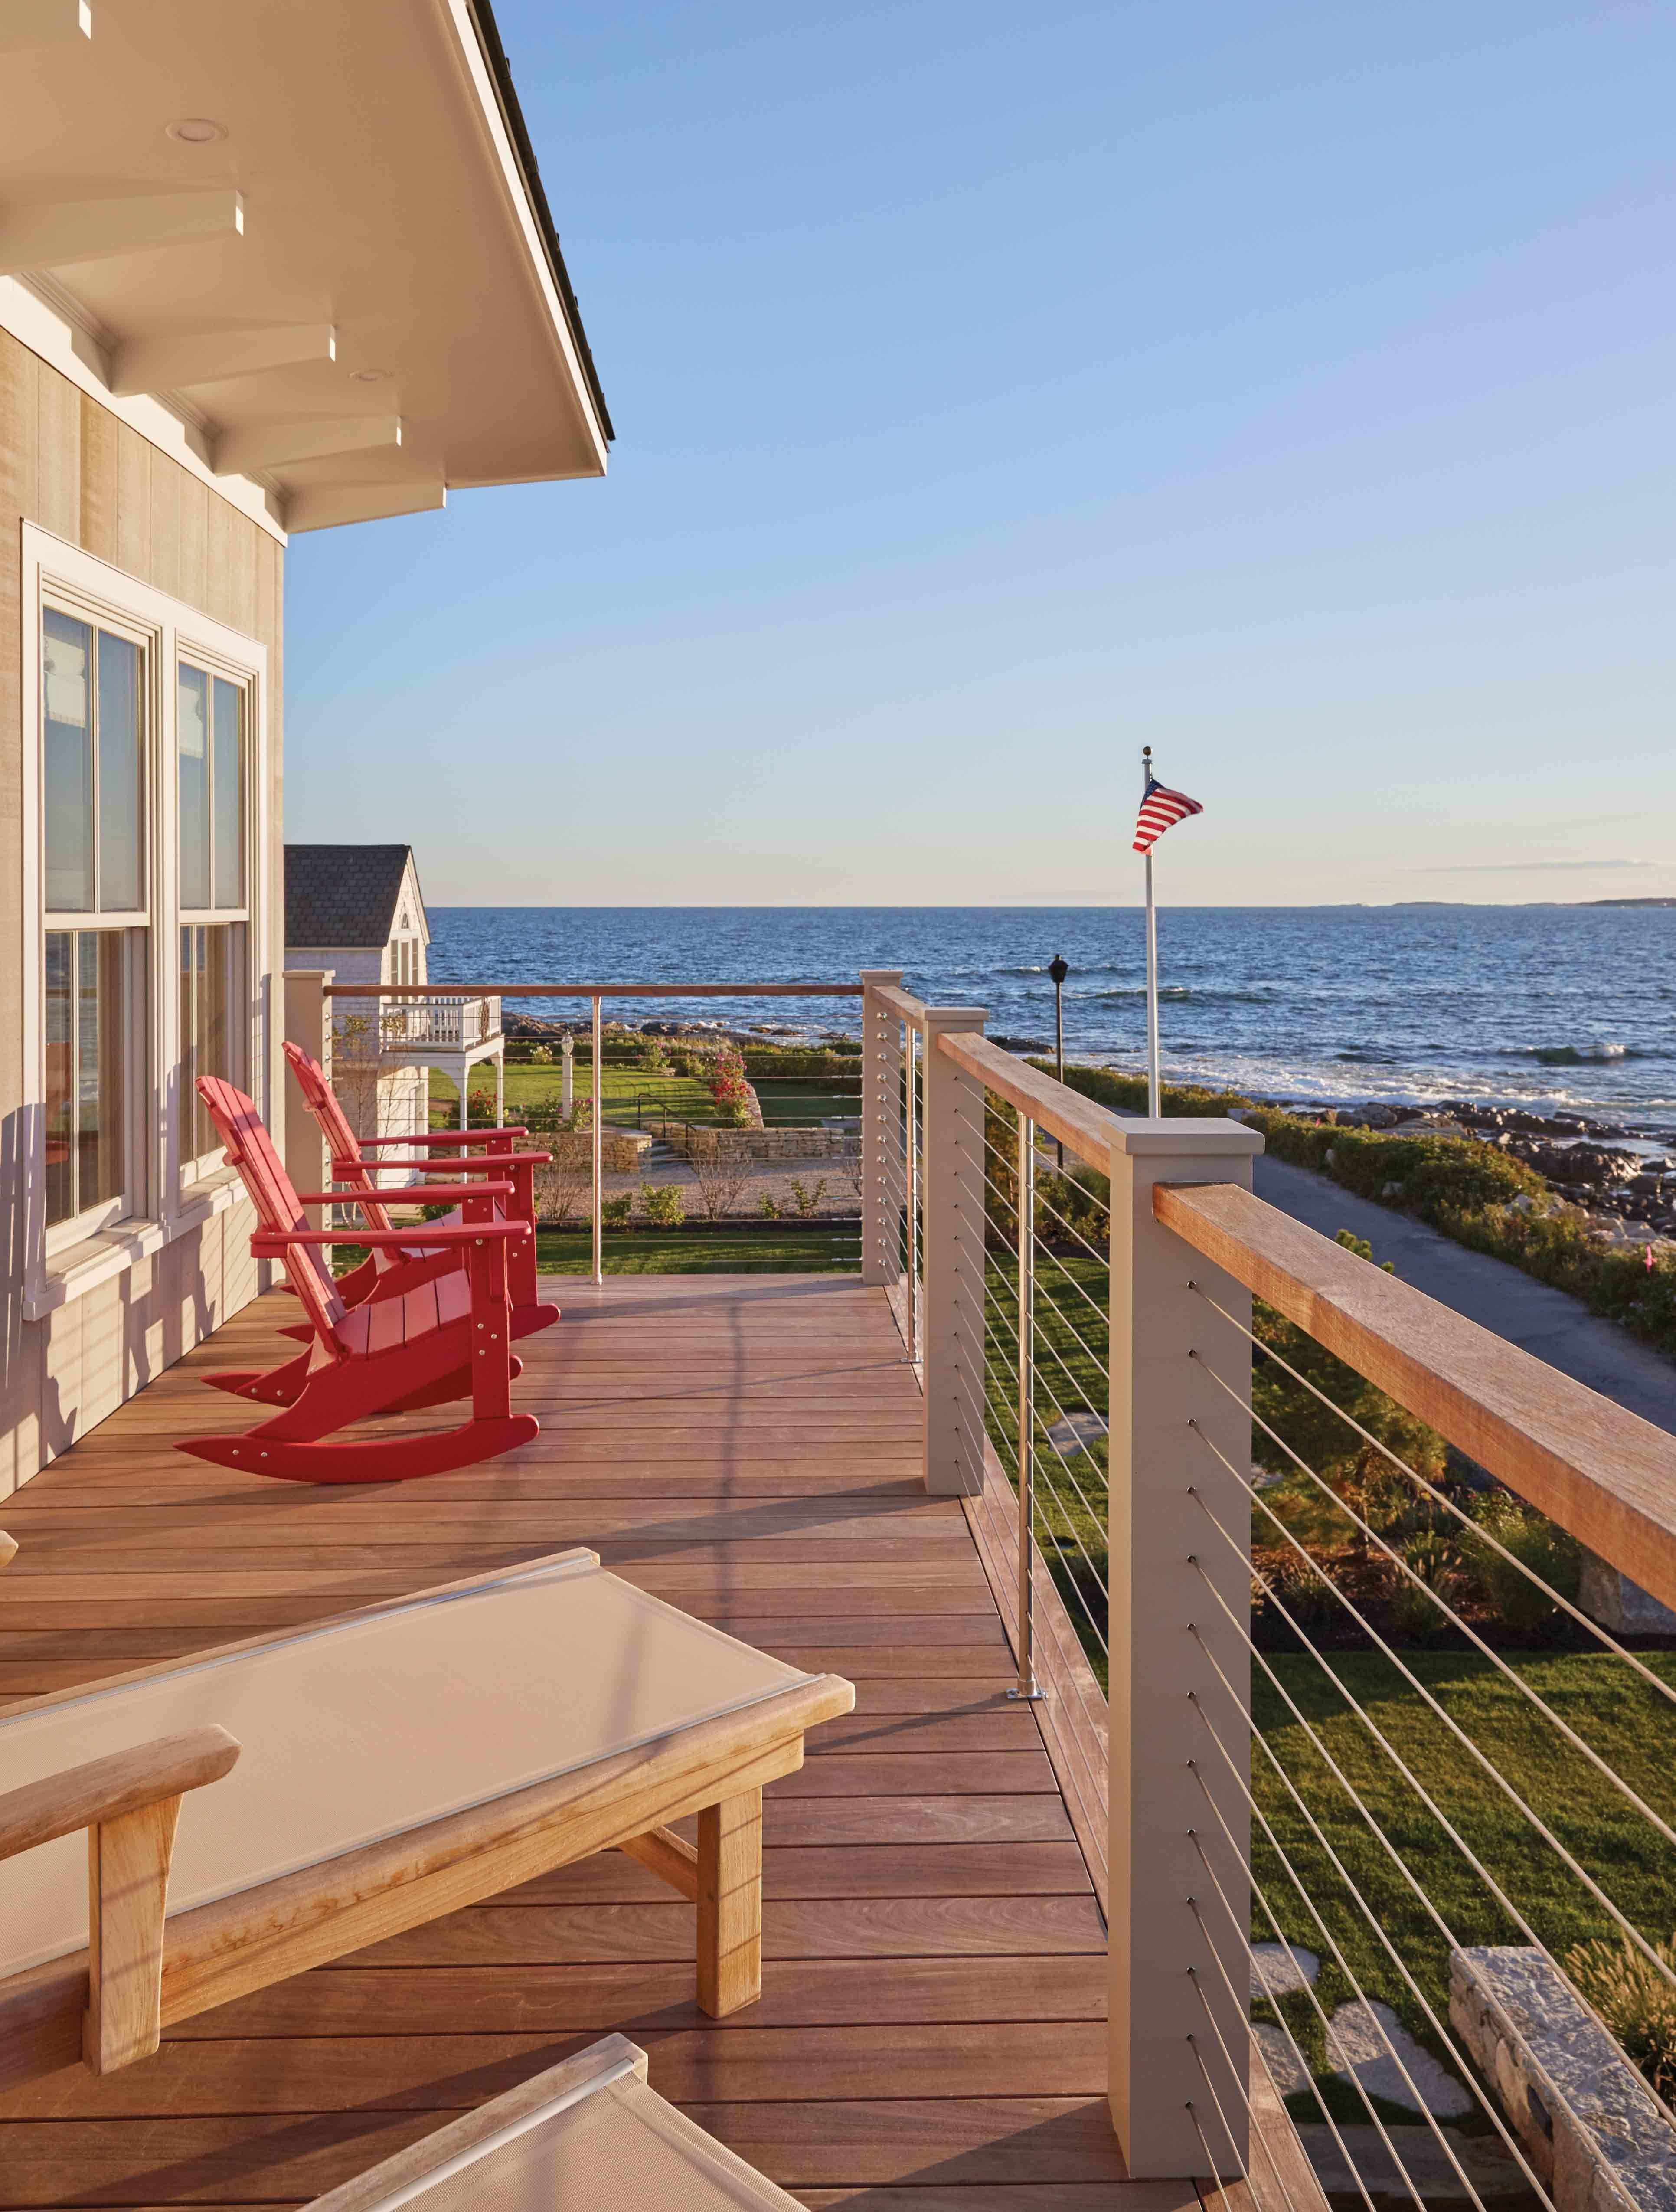 Building A Sense Of History Maine Home Design House Design Second Story Deck Guest House